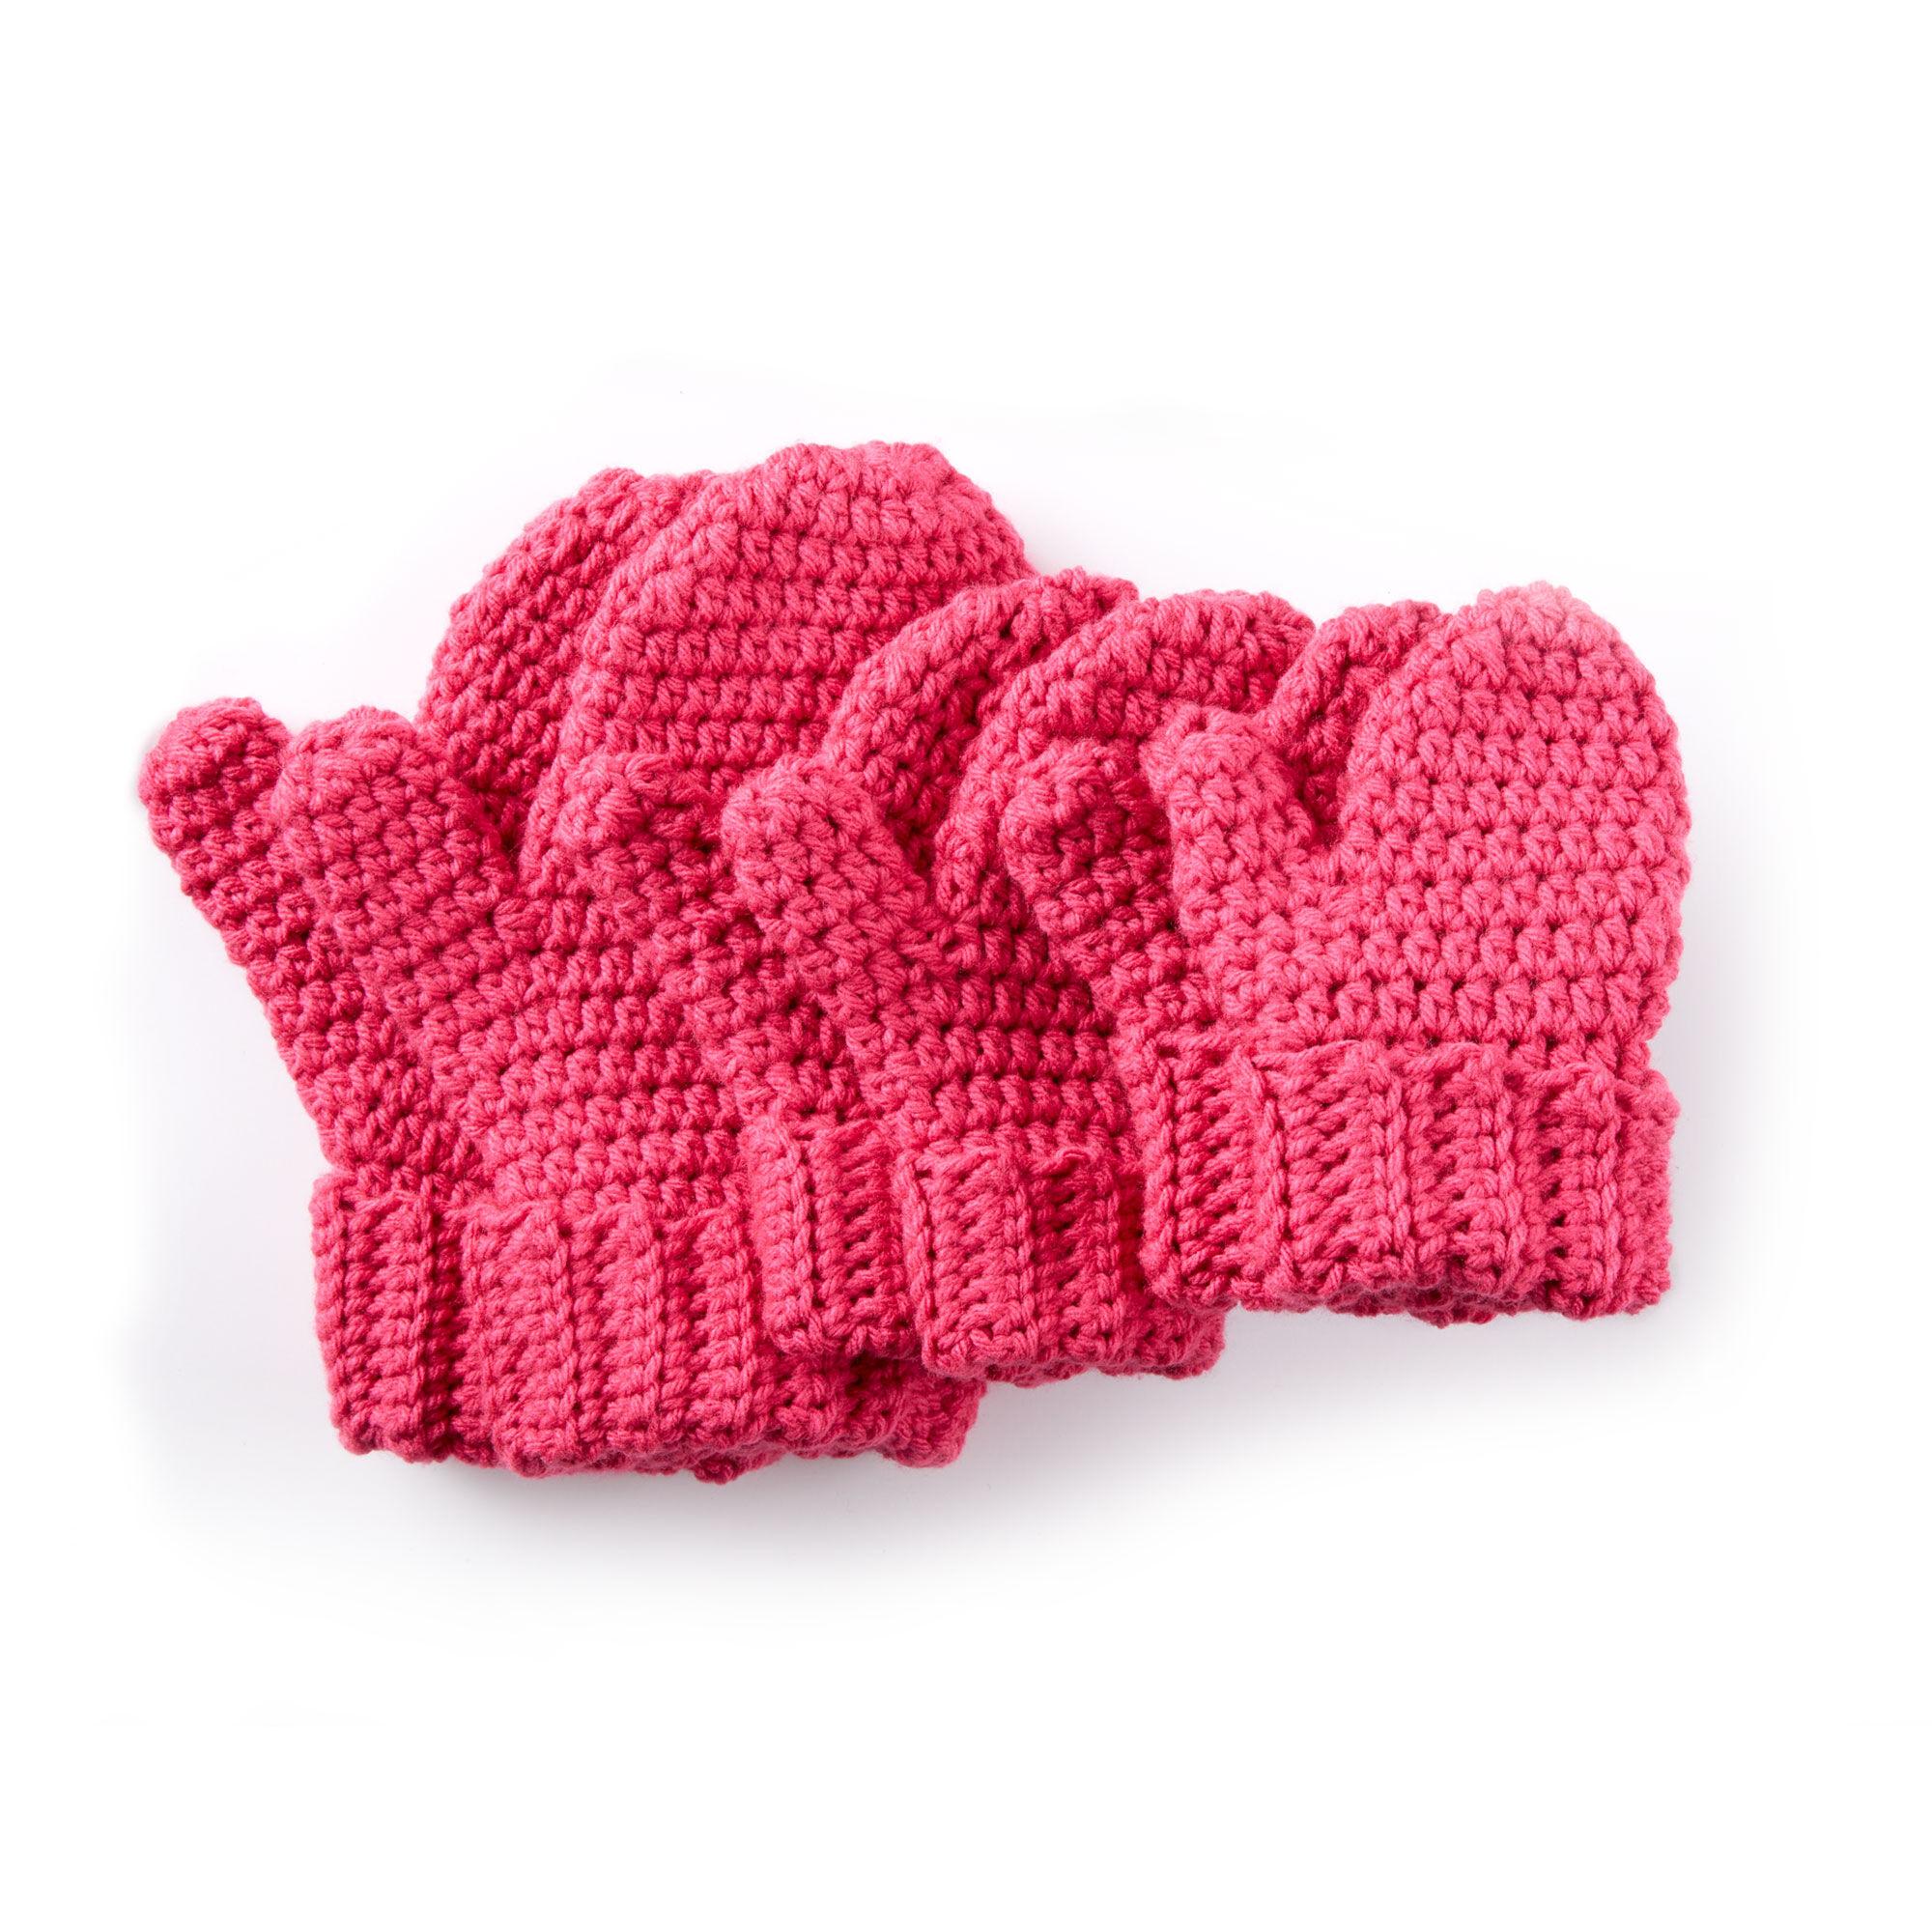 Caron Hands Full Crochet Mittens, Blue | Yarnspirations